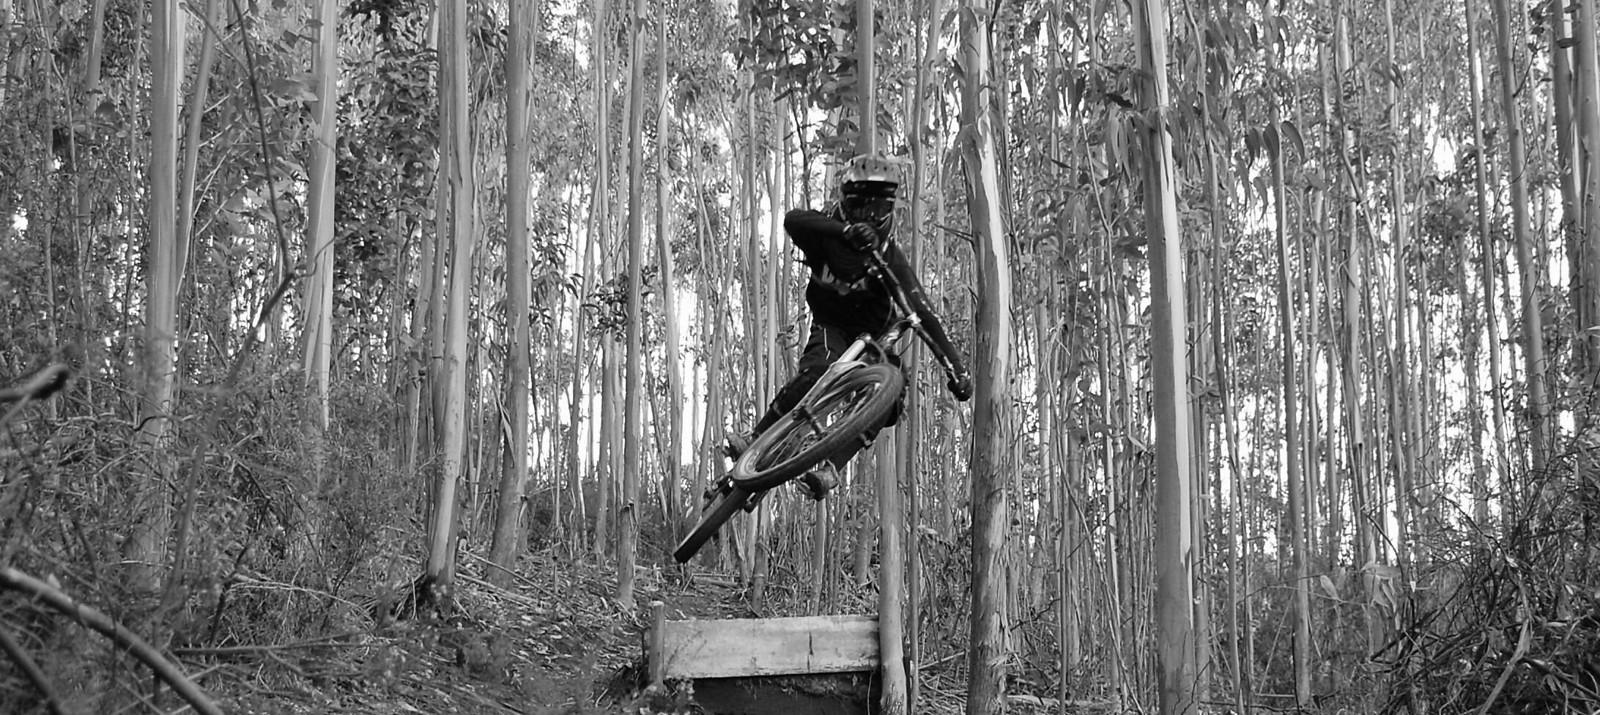 Paul track - antonio.mendes.3363 - Mountain Biking Pictures - Vital MTB